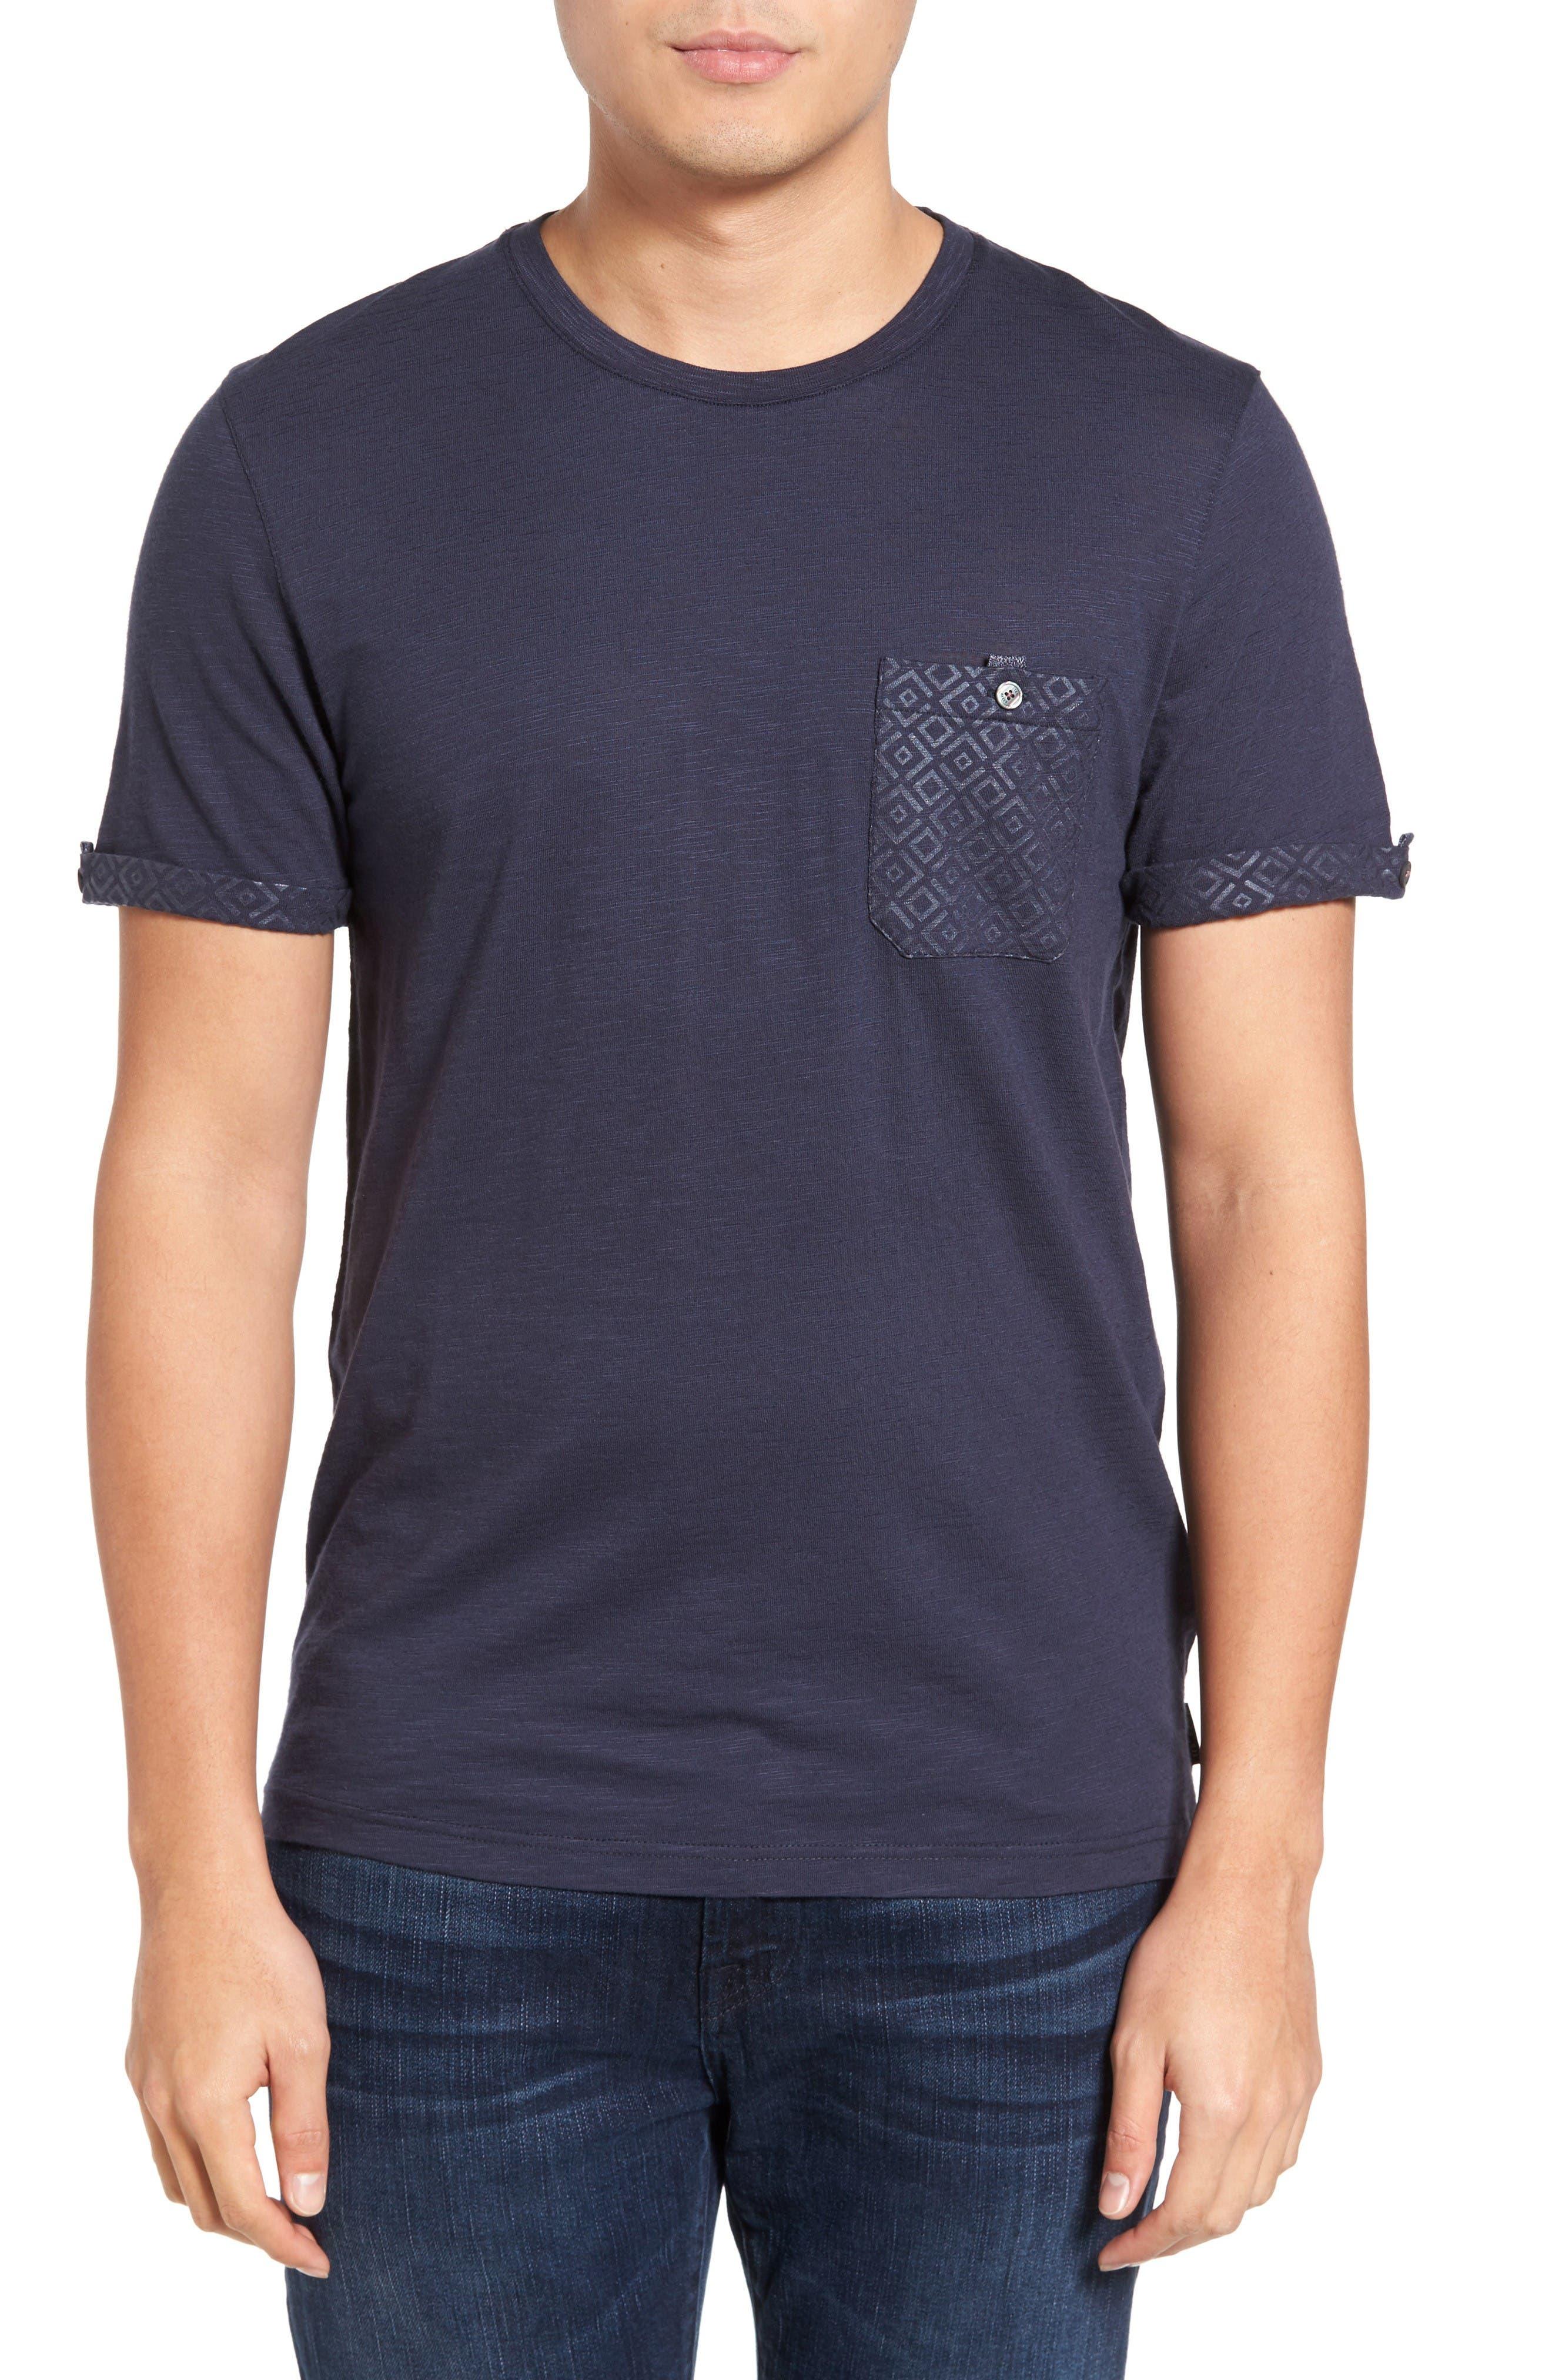 Main Image - Ted Baker London Apel Print Pocket T-Shirt